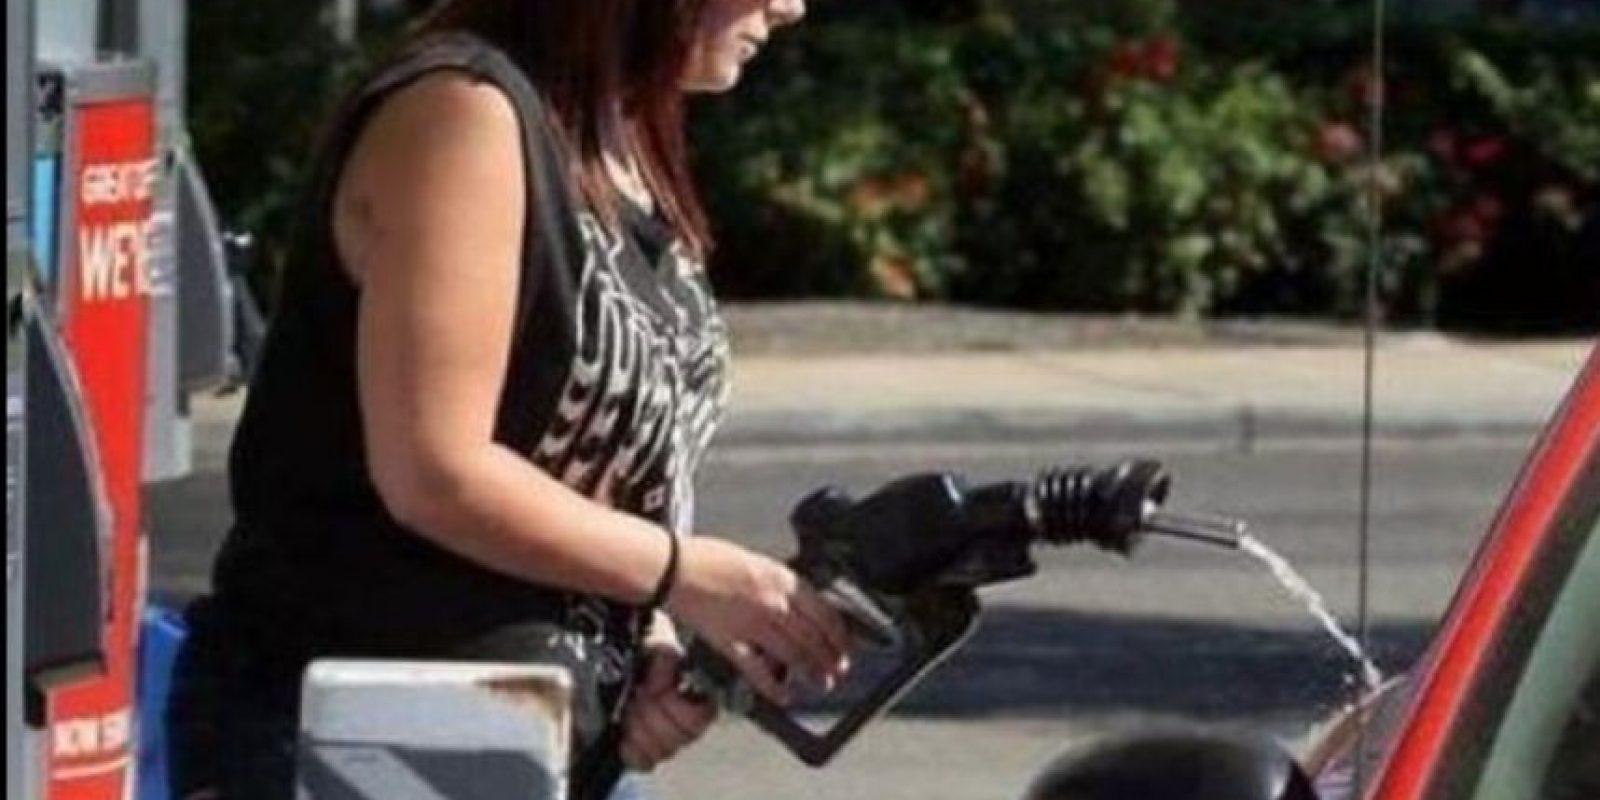 A lavar el auto con gasolina. Foto:StupidPeople.com